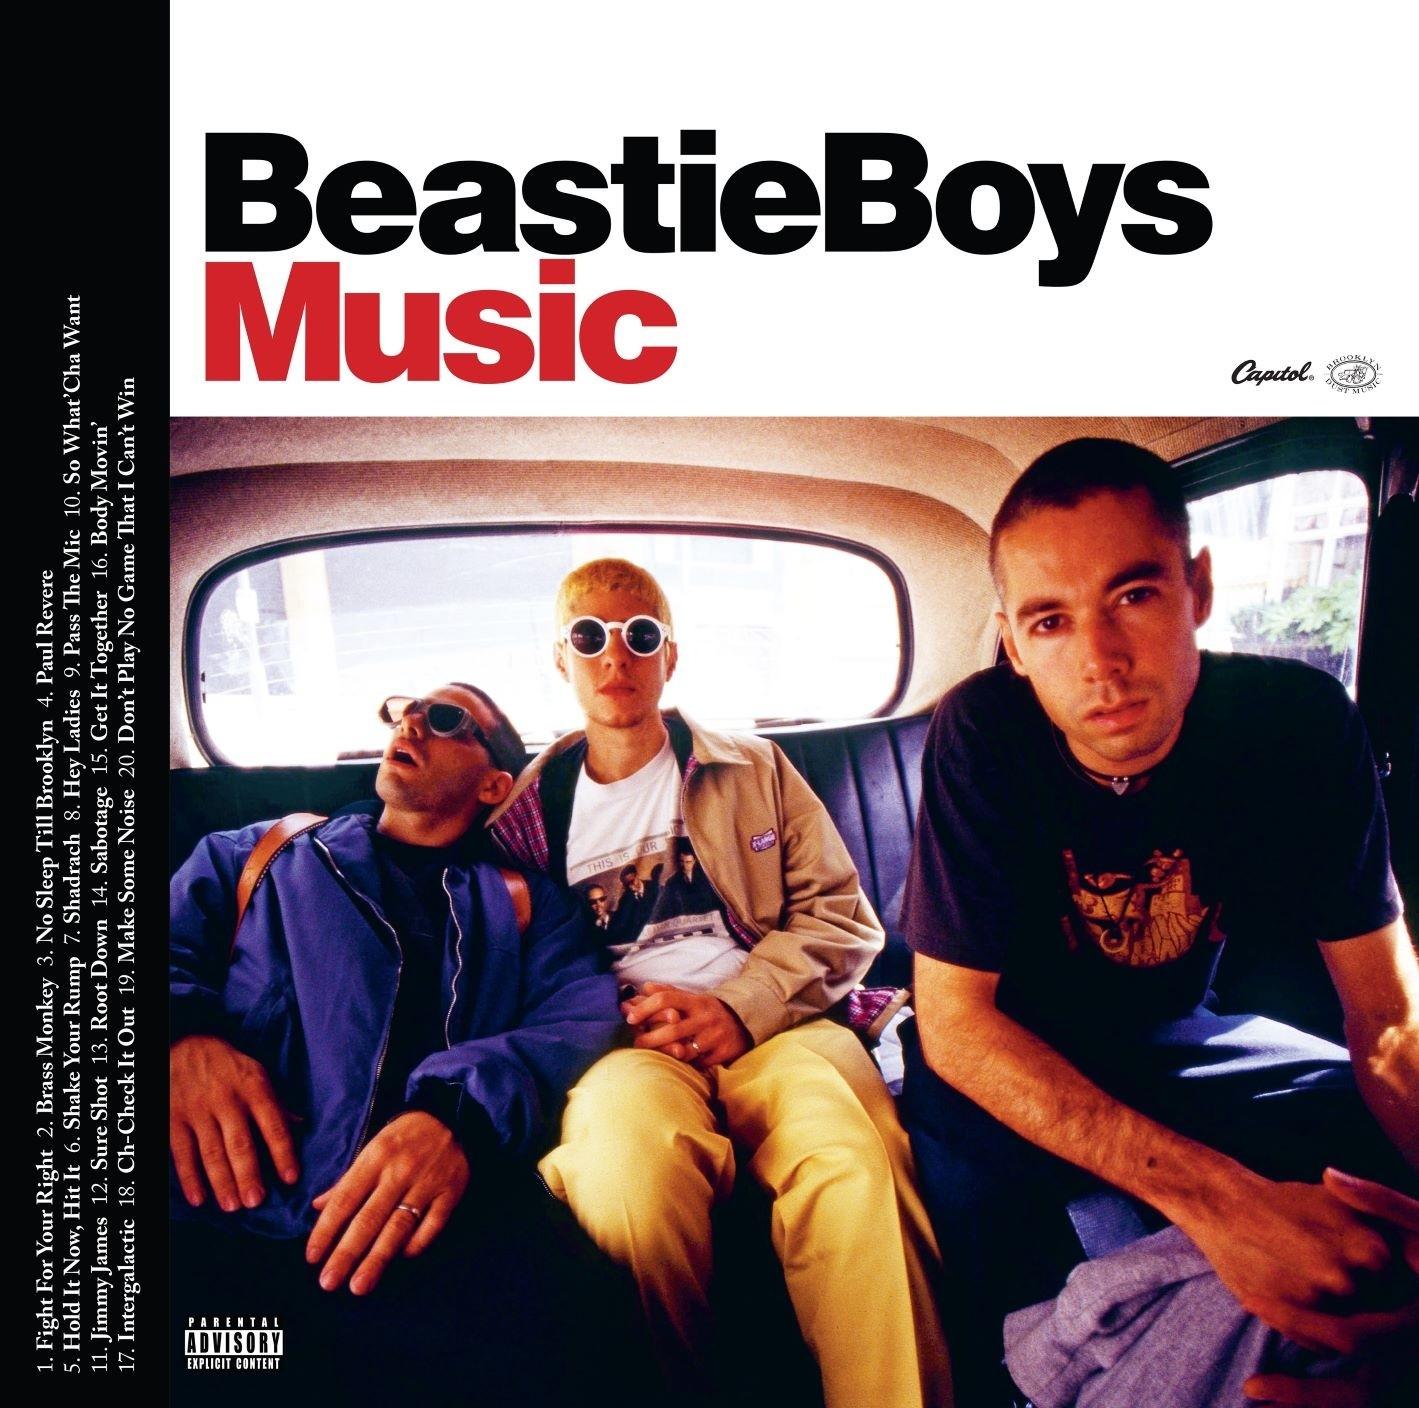 Beastie Boys - Beastie Boys Music 2XLP